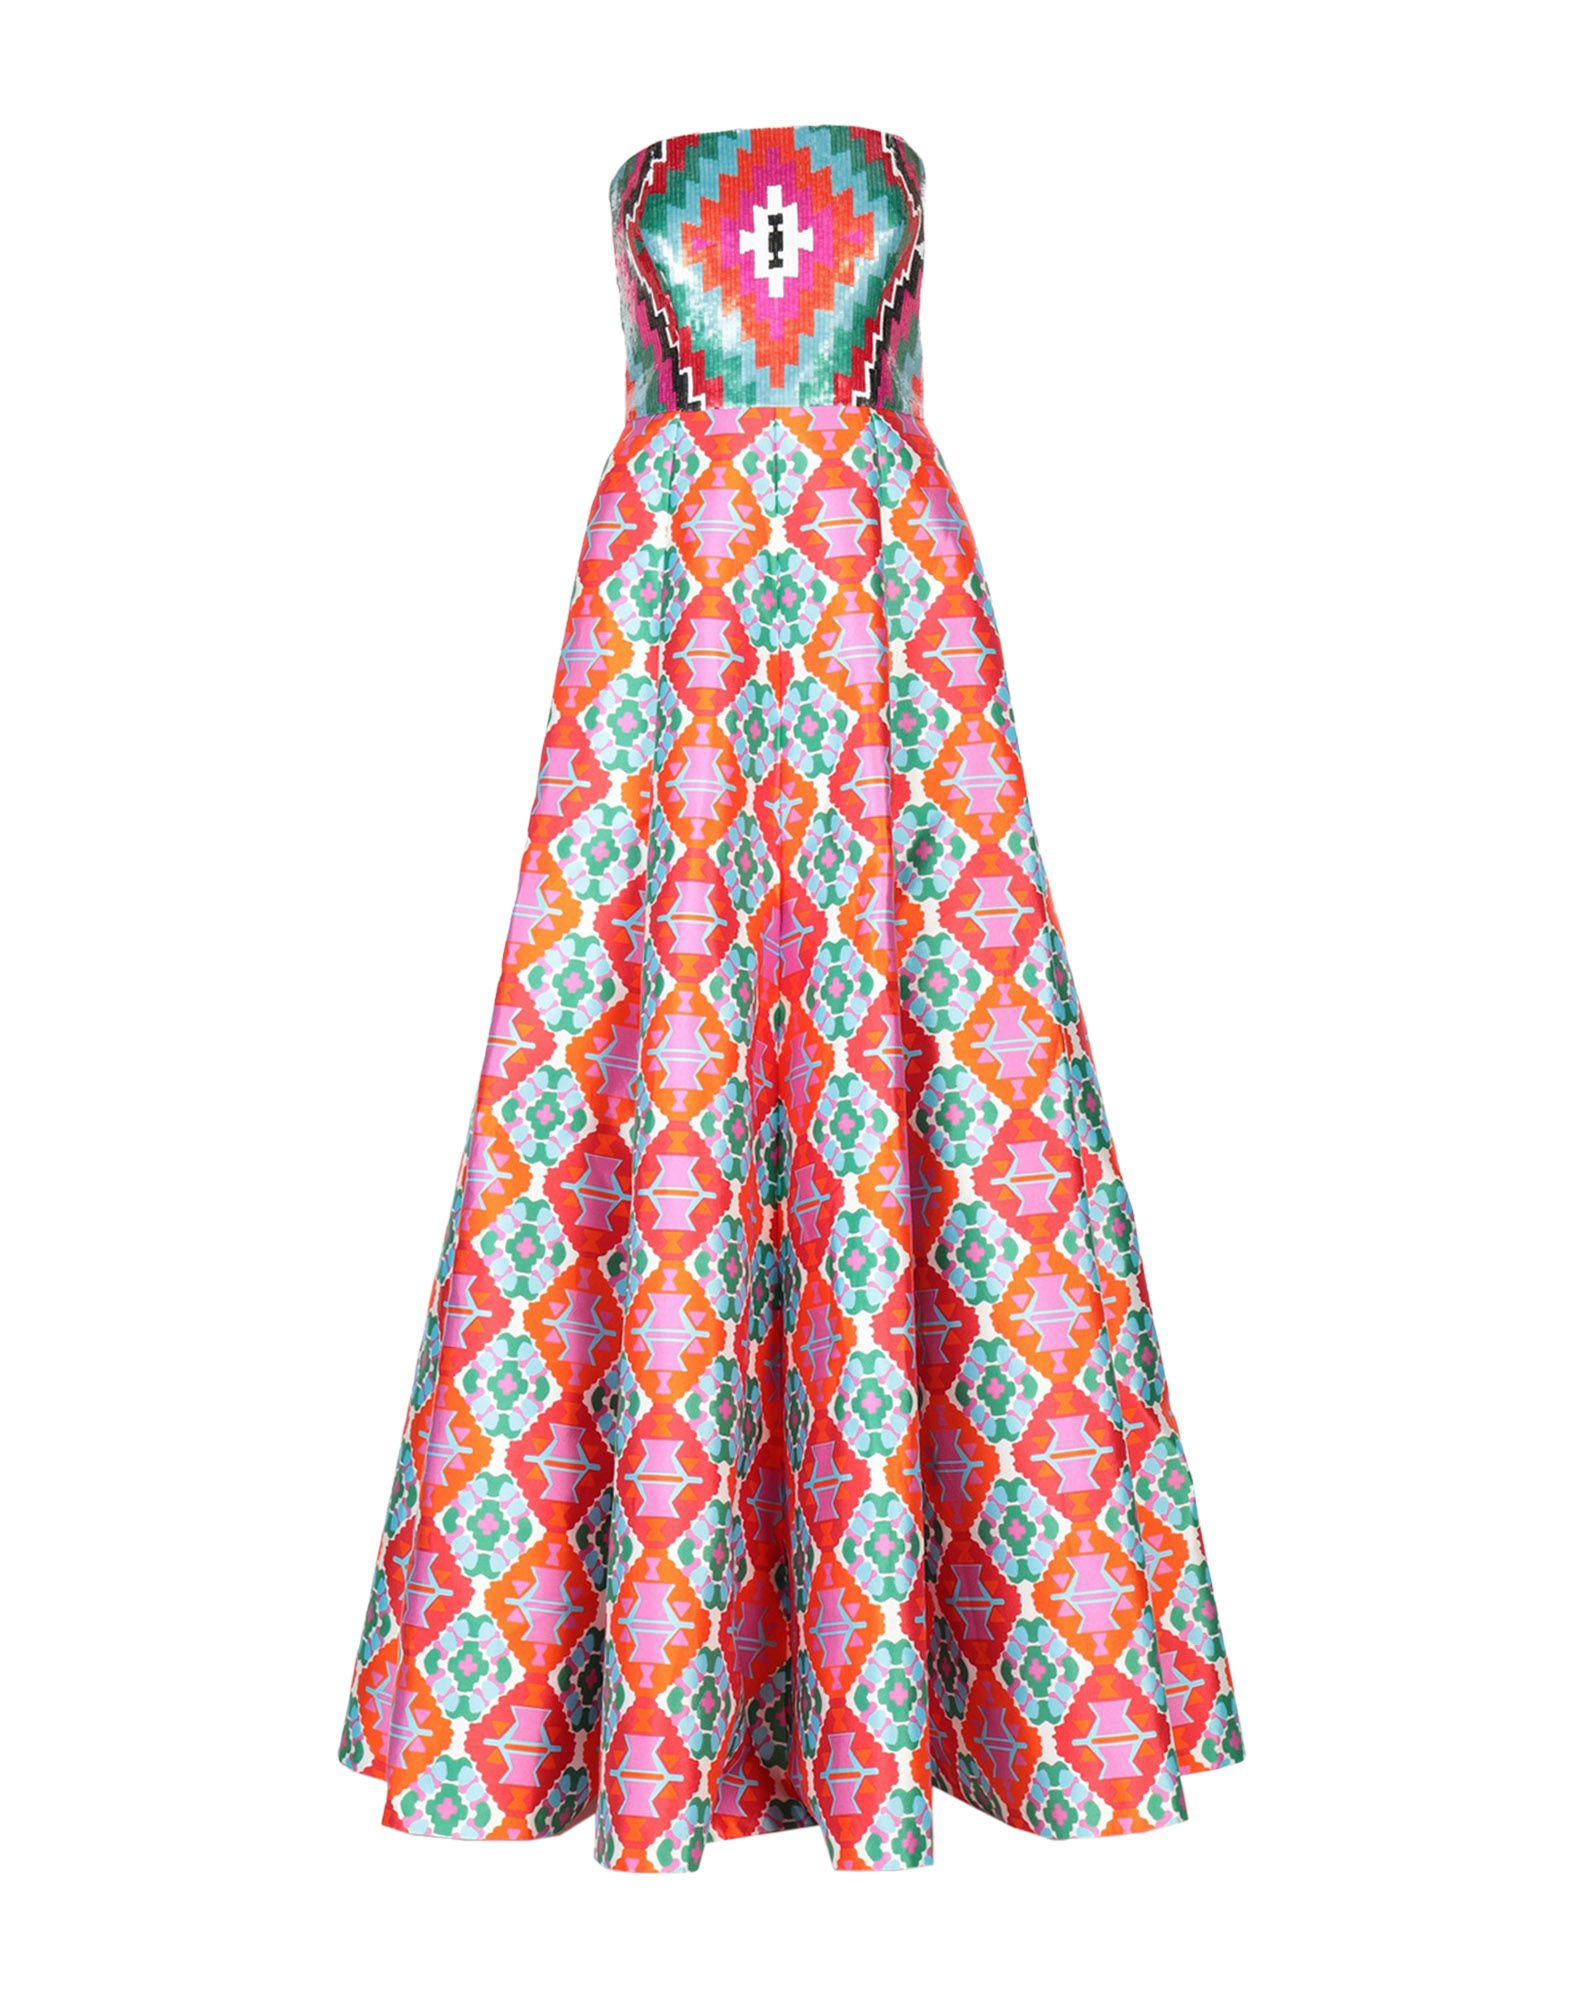 ANDREW GN Long Dress in Fuchsia